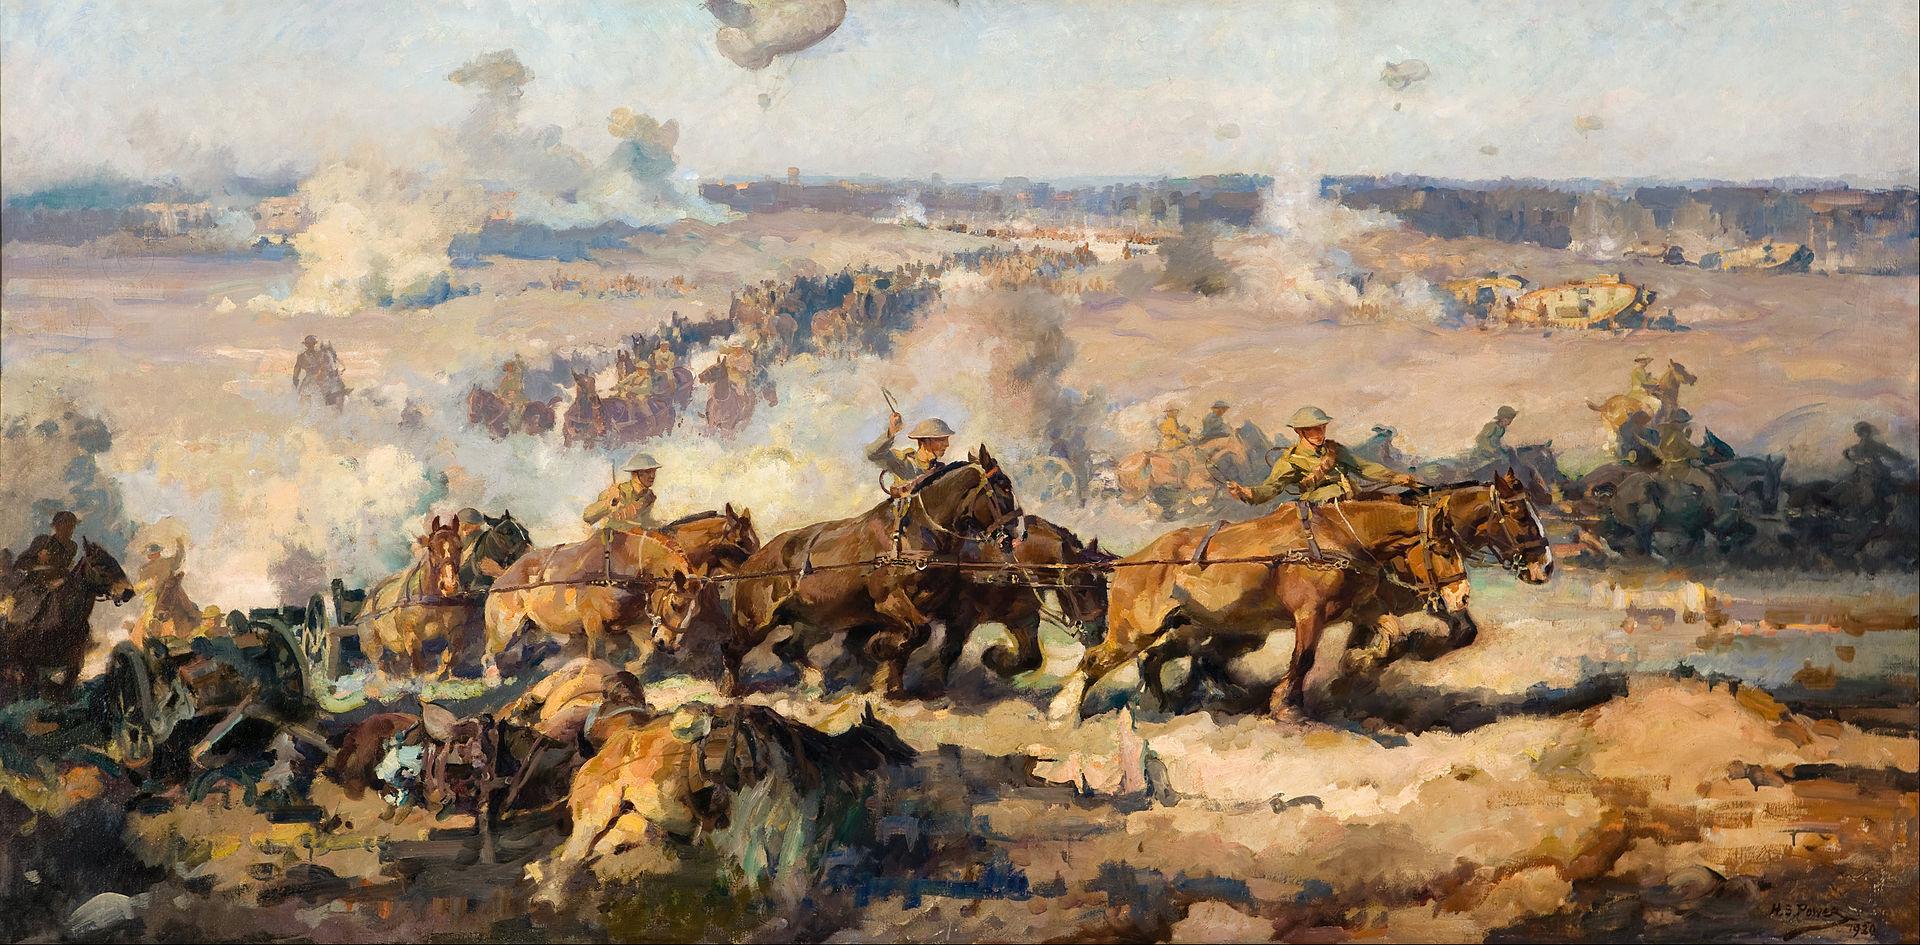 Septimus_Power_-_The_battle_before_Villers-Bretonneux,_August_8th,_1918_-_Google_Art_Project.jpg